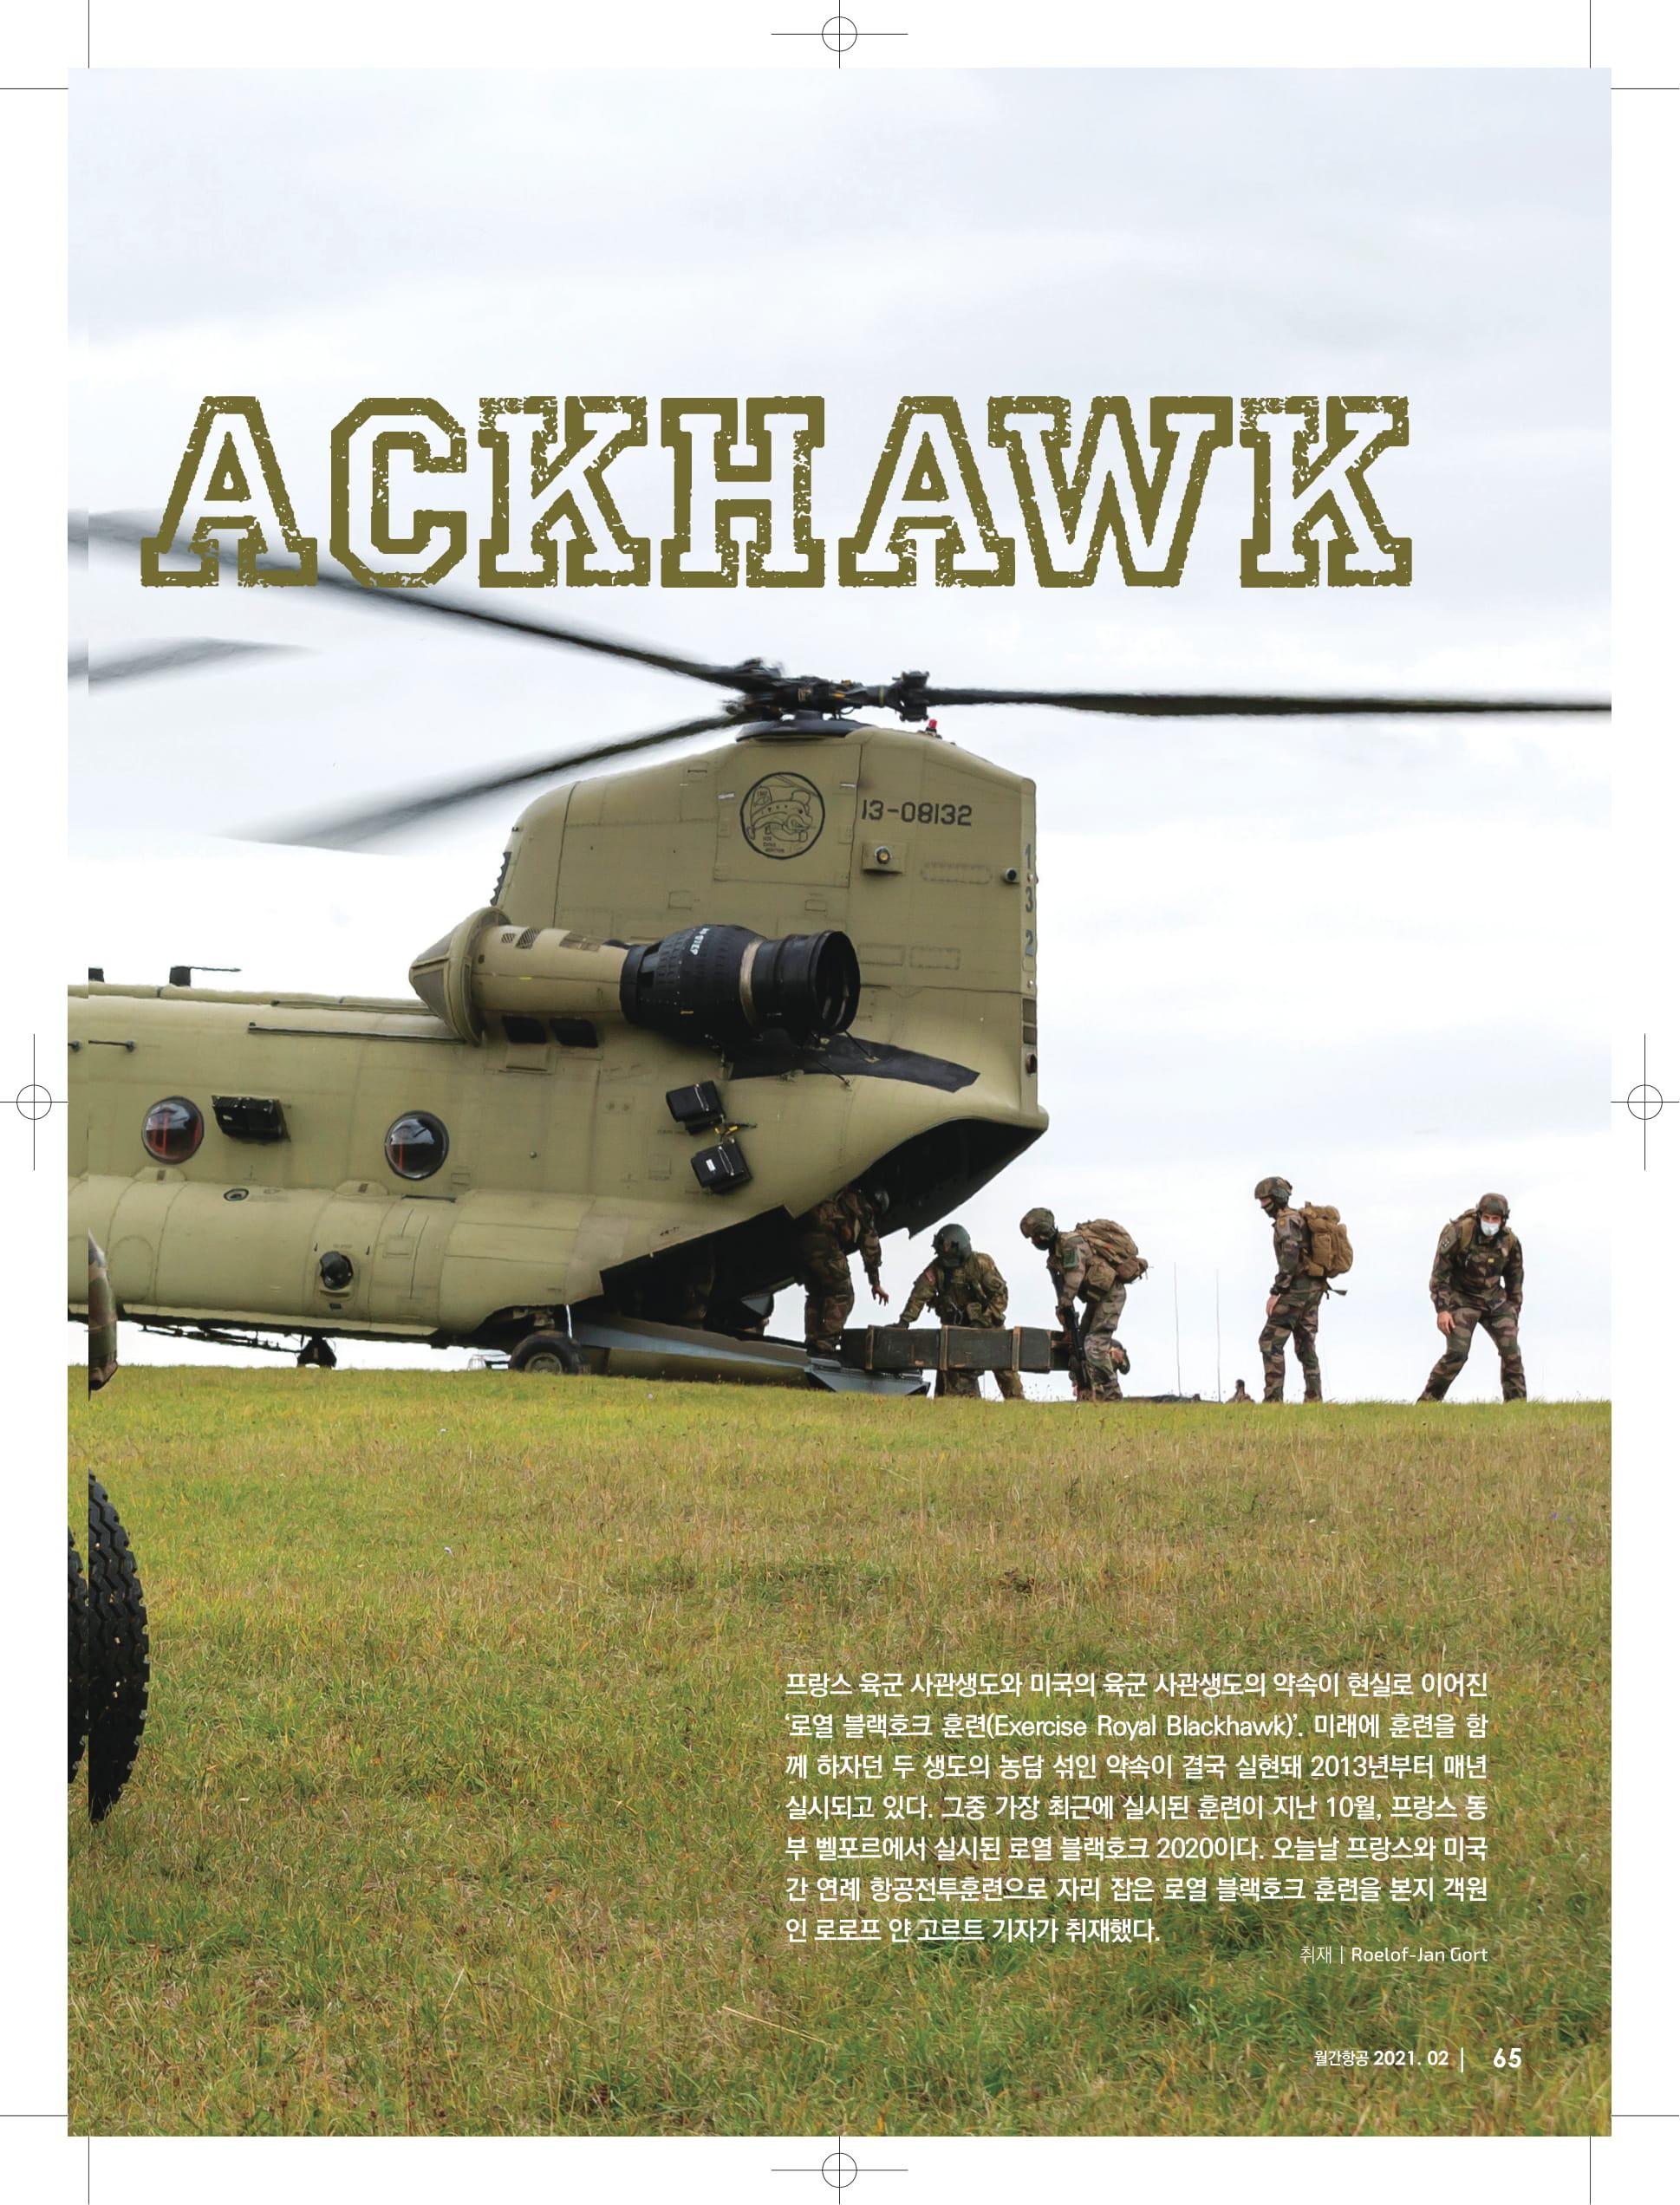 [AnD KOR] Royal Blackhawk (2021.02)-02